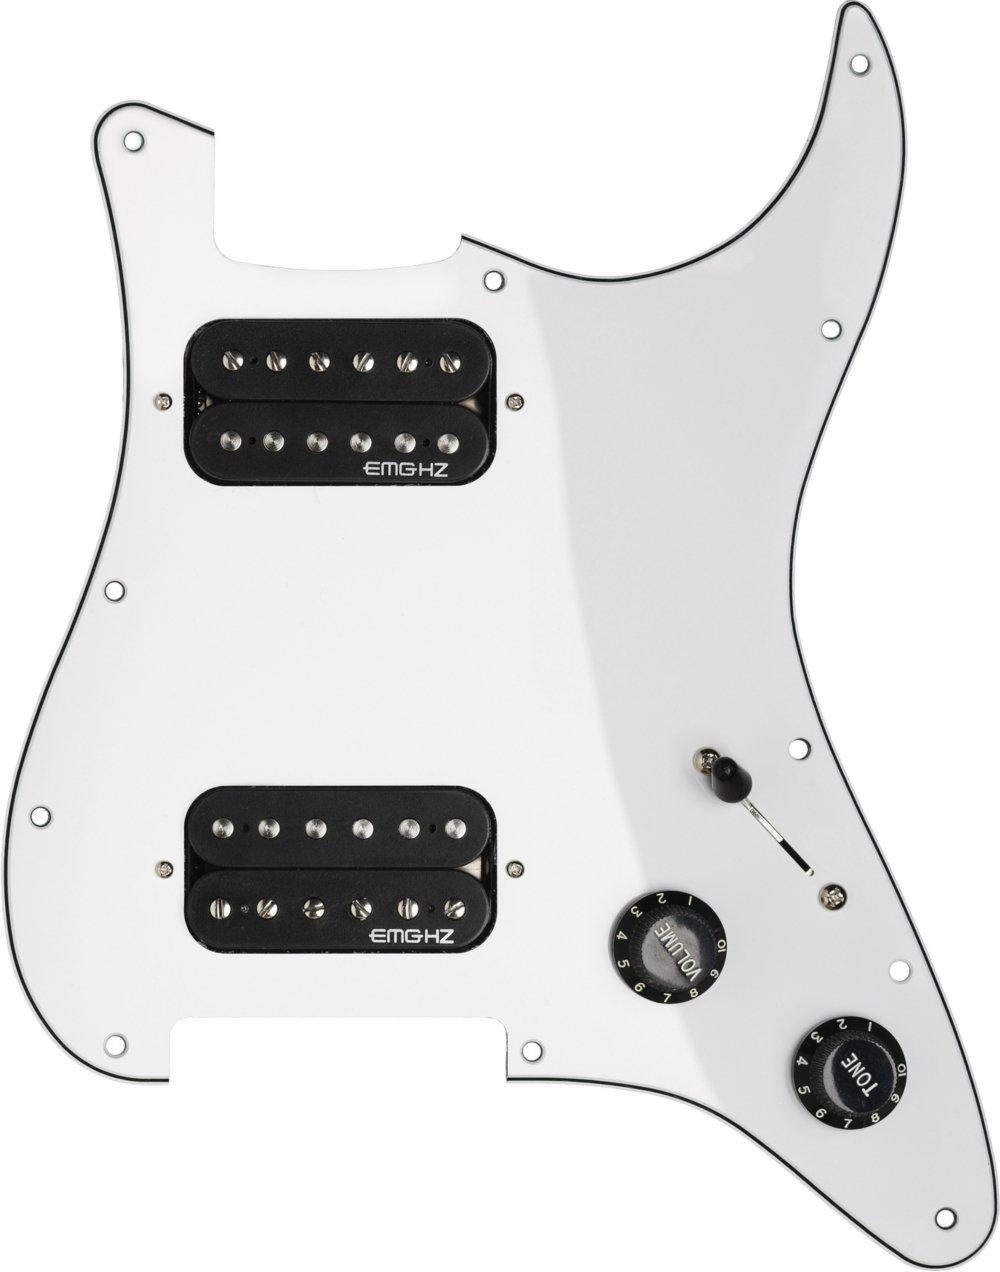 Emg Em904295 E Guitar St12 W Hz Series Pickup Musical Bass Pickups Wiring Diagram 40 Instruments